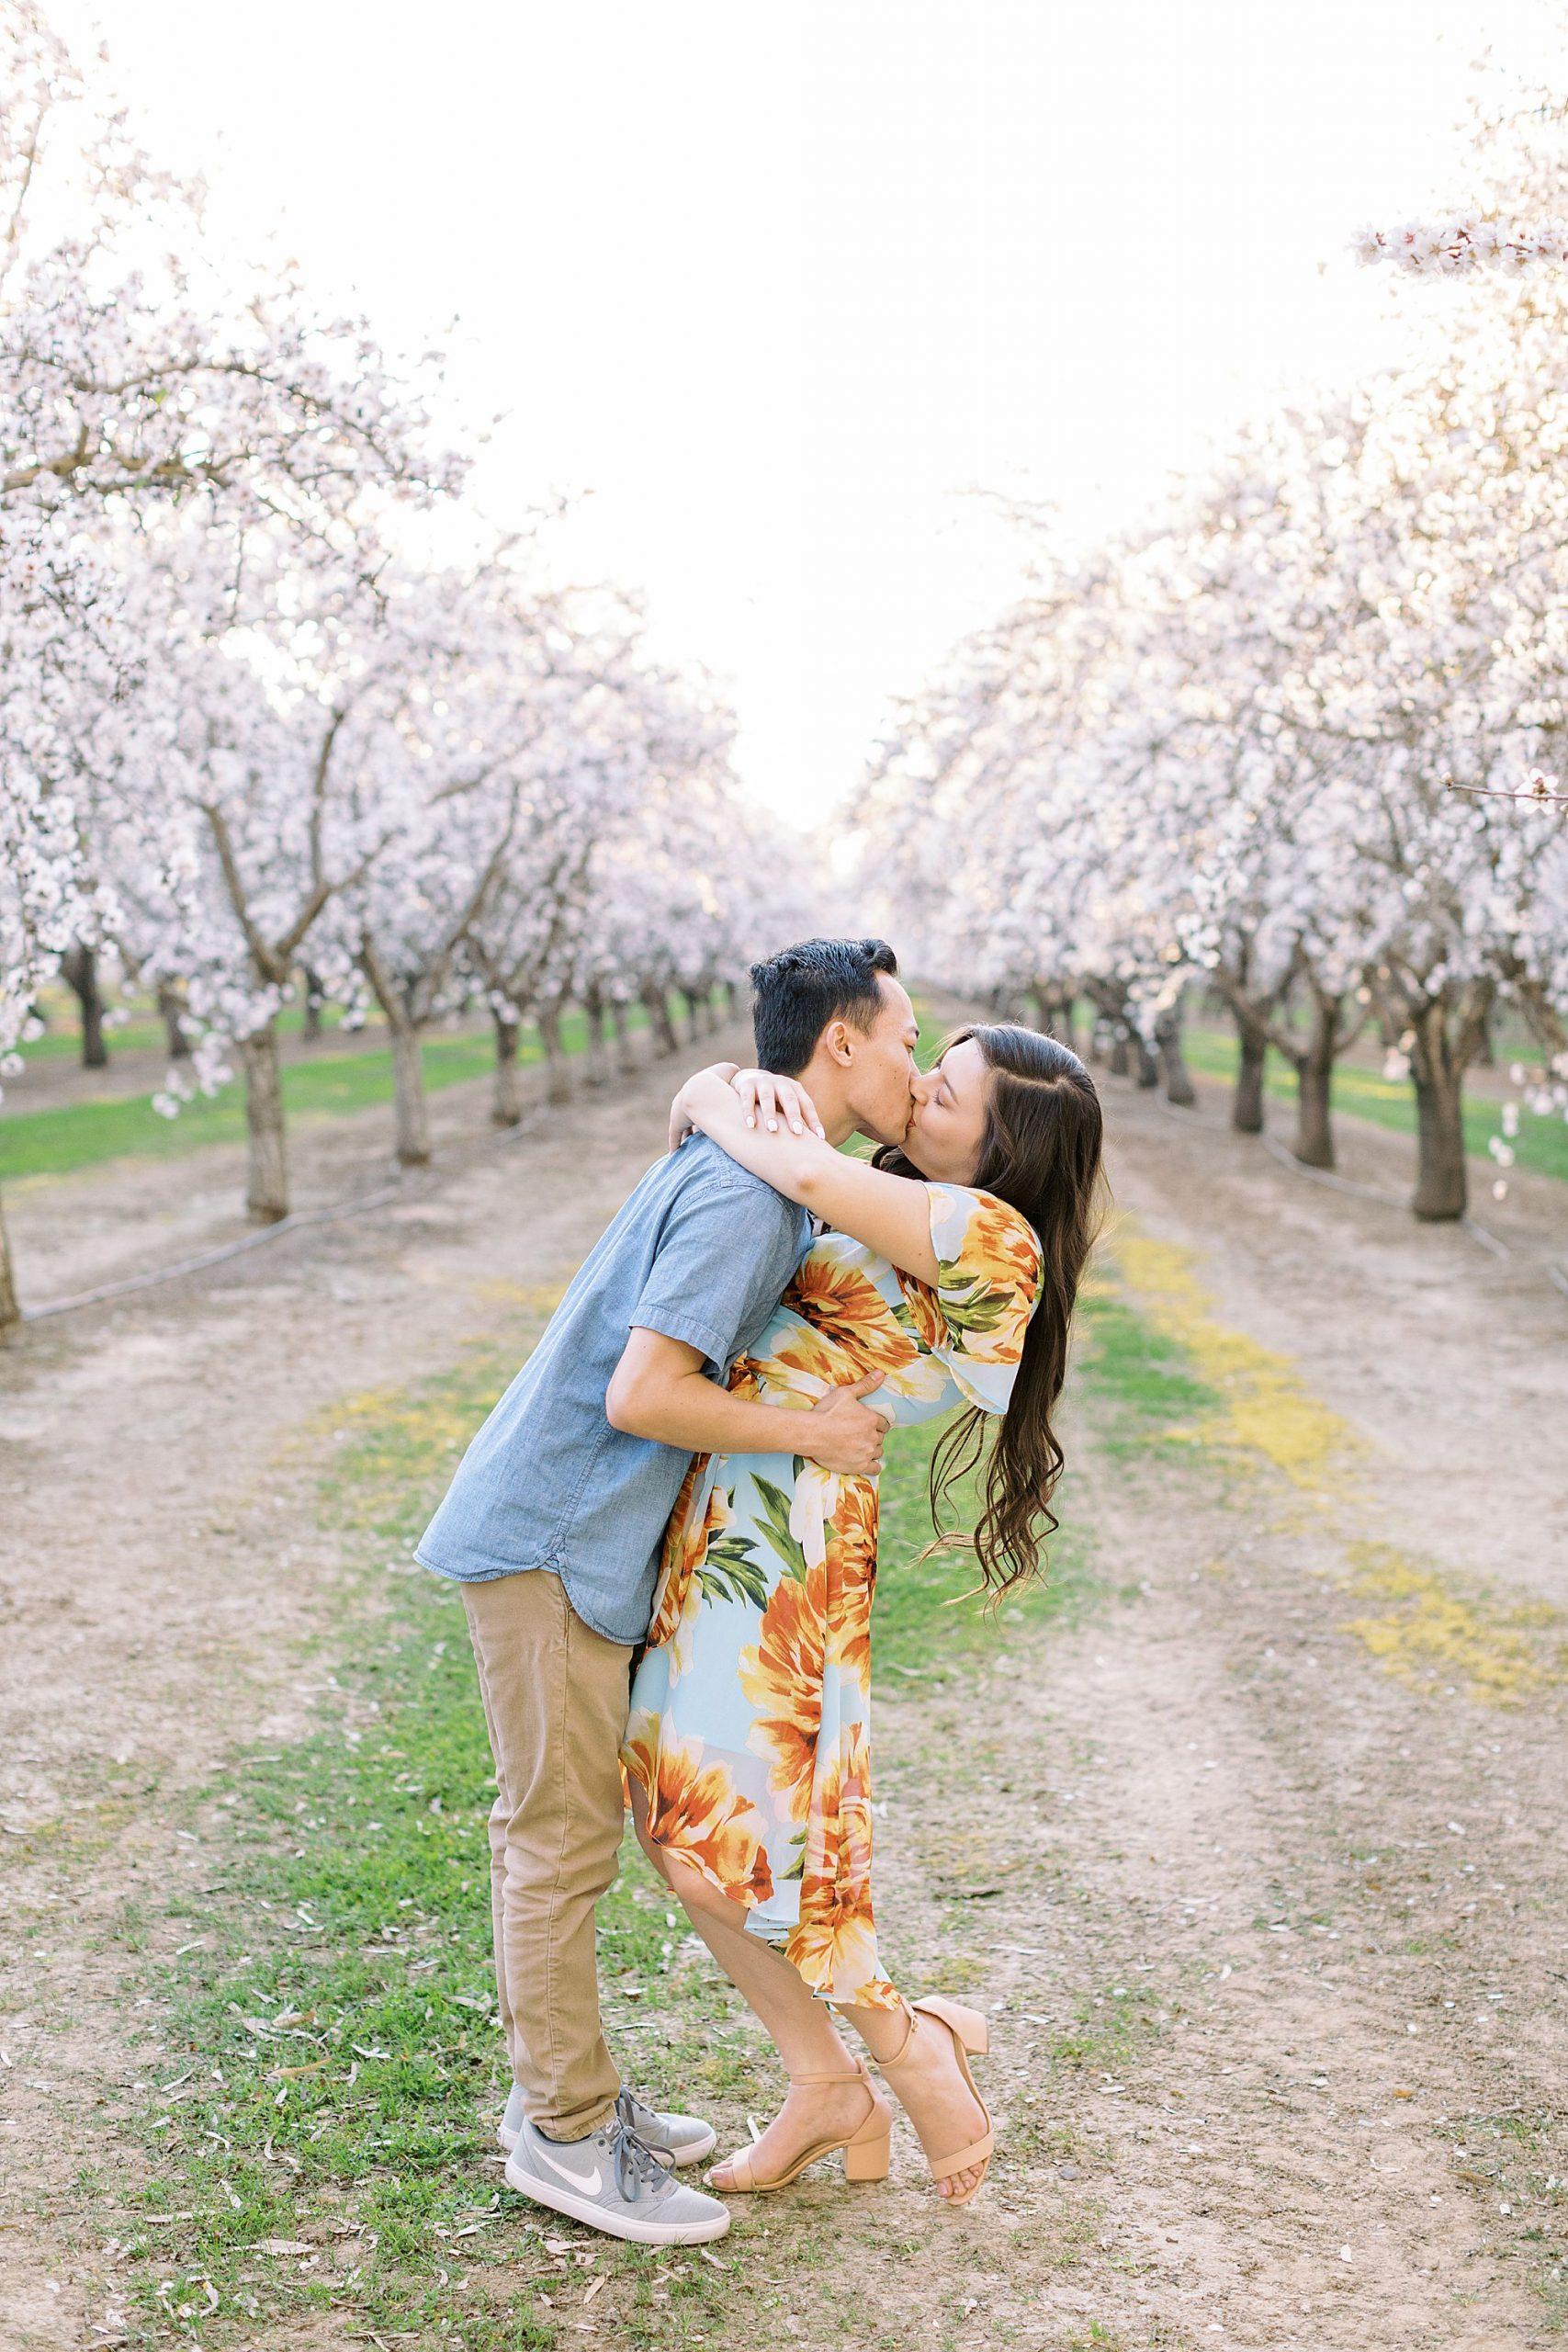 Almond Orchard Engagement Session - Caley and Tyler - Lone Oak Wedding - Ashley Baumgartner - Almond Blossom_0021.jpg